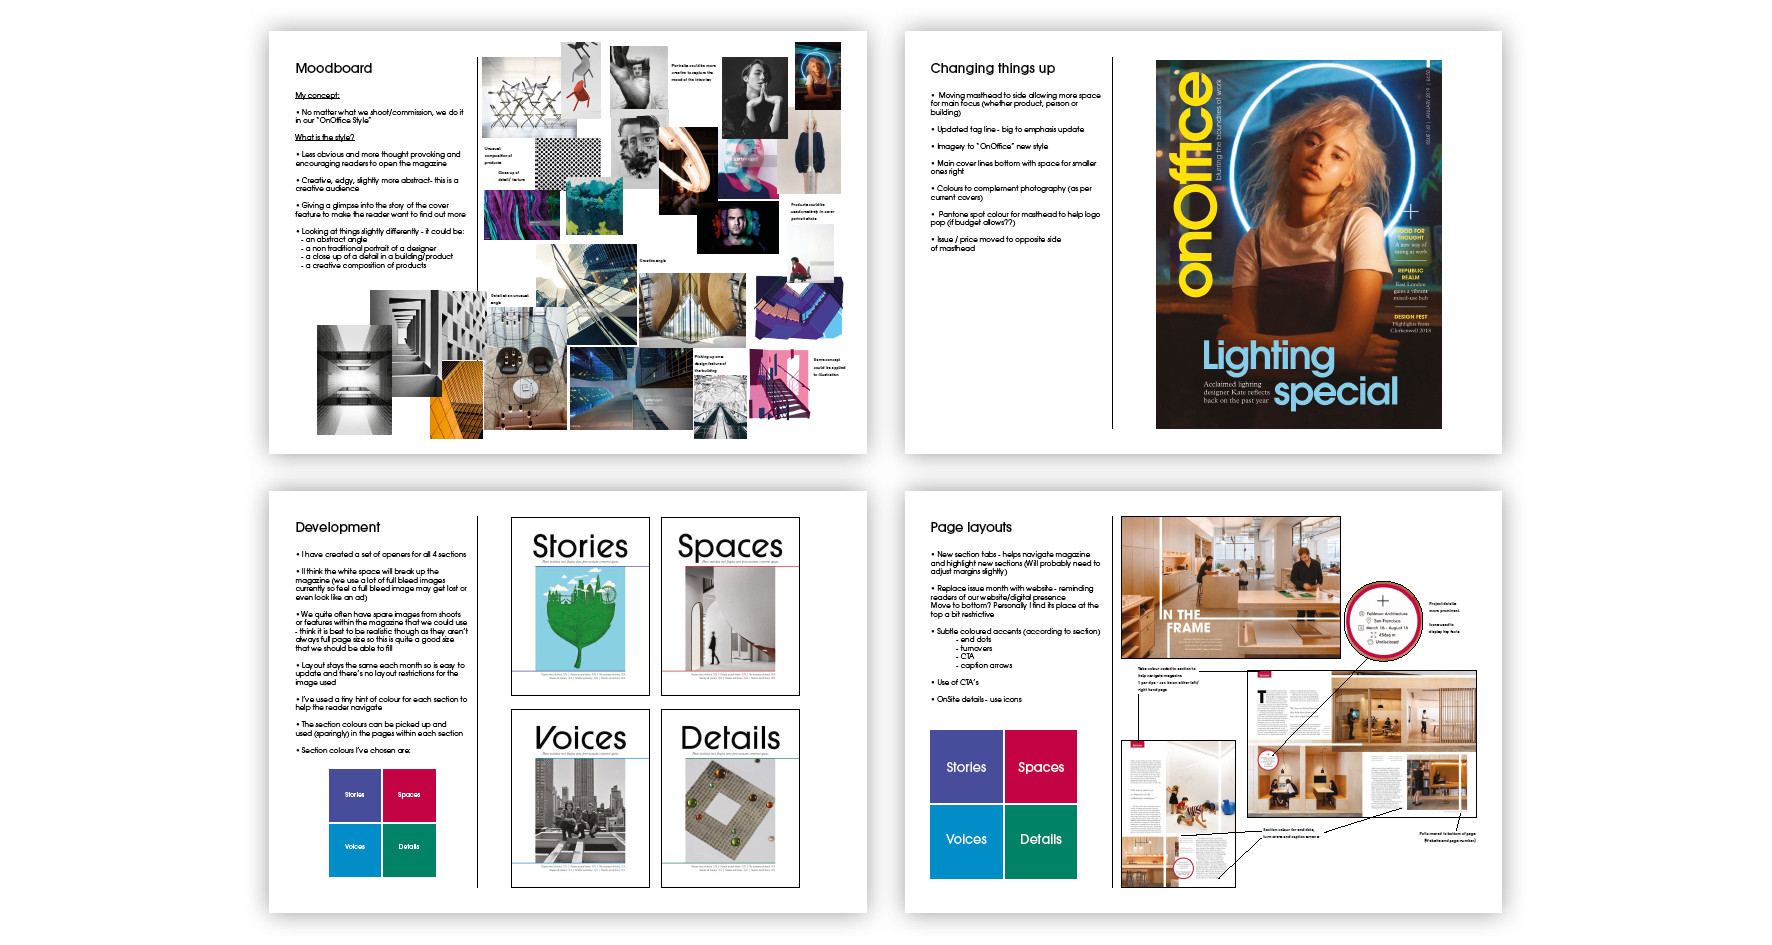 OnOffice brand development